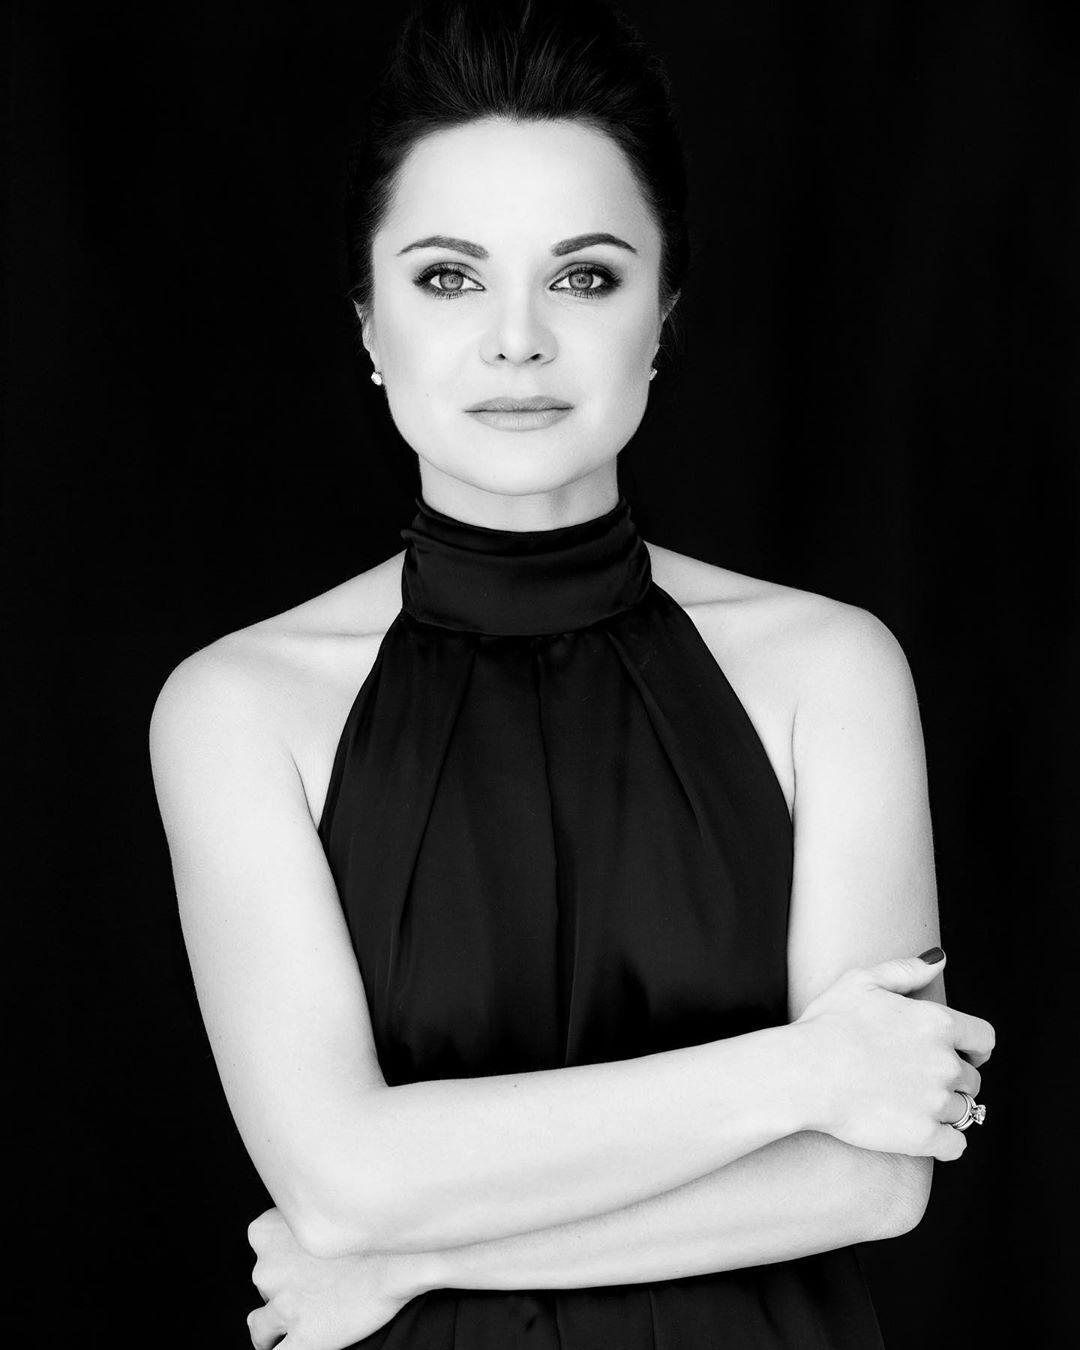 Лилия Подкопаева на черно-белом фоне